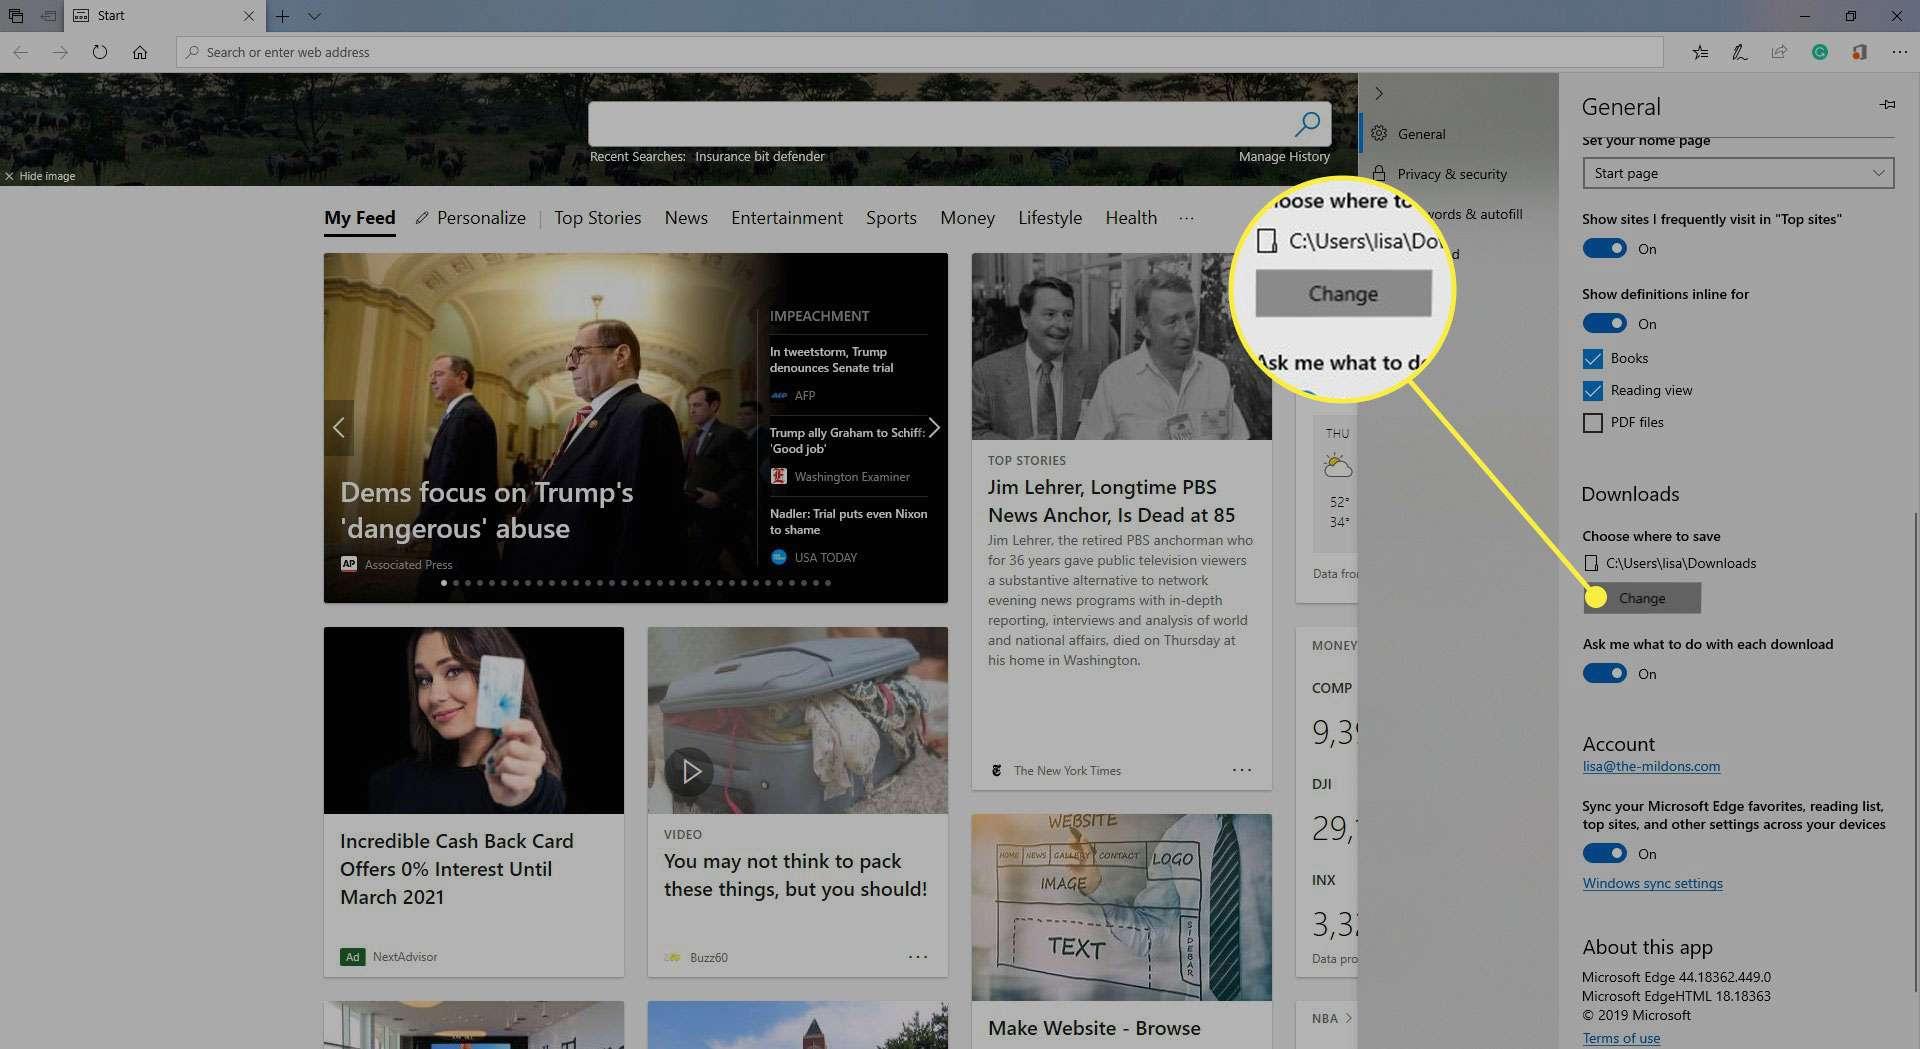 A screenshot of Microsoft Edge's settings with the